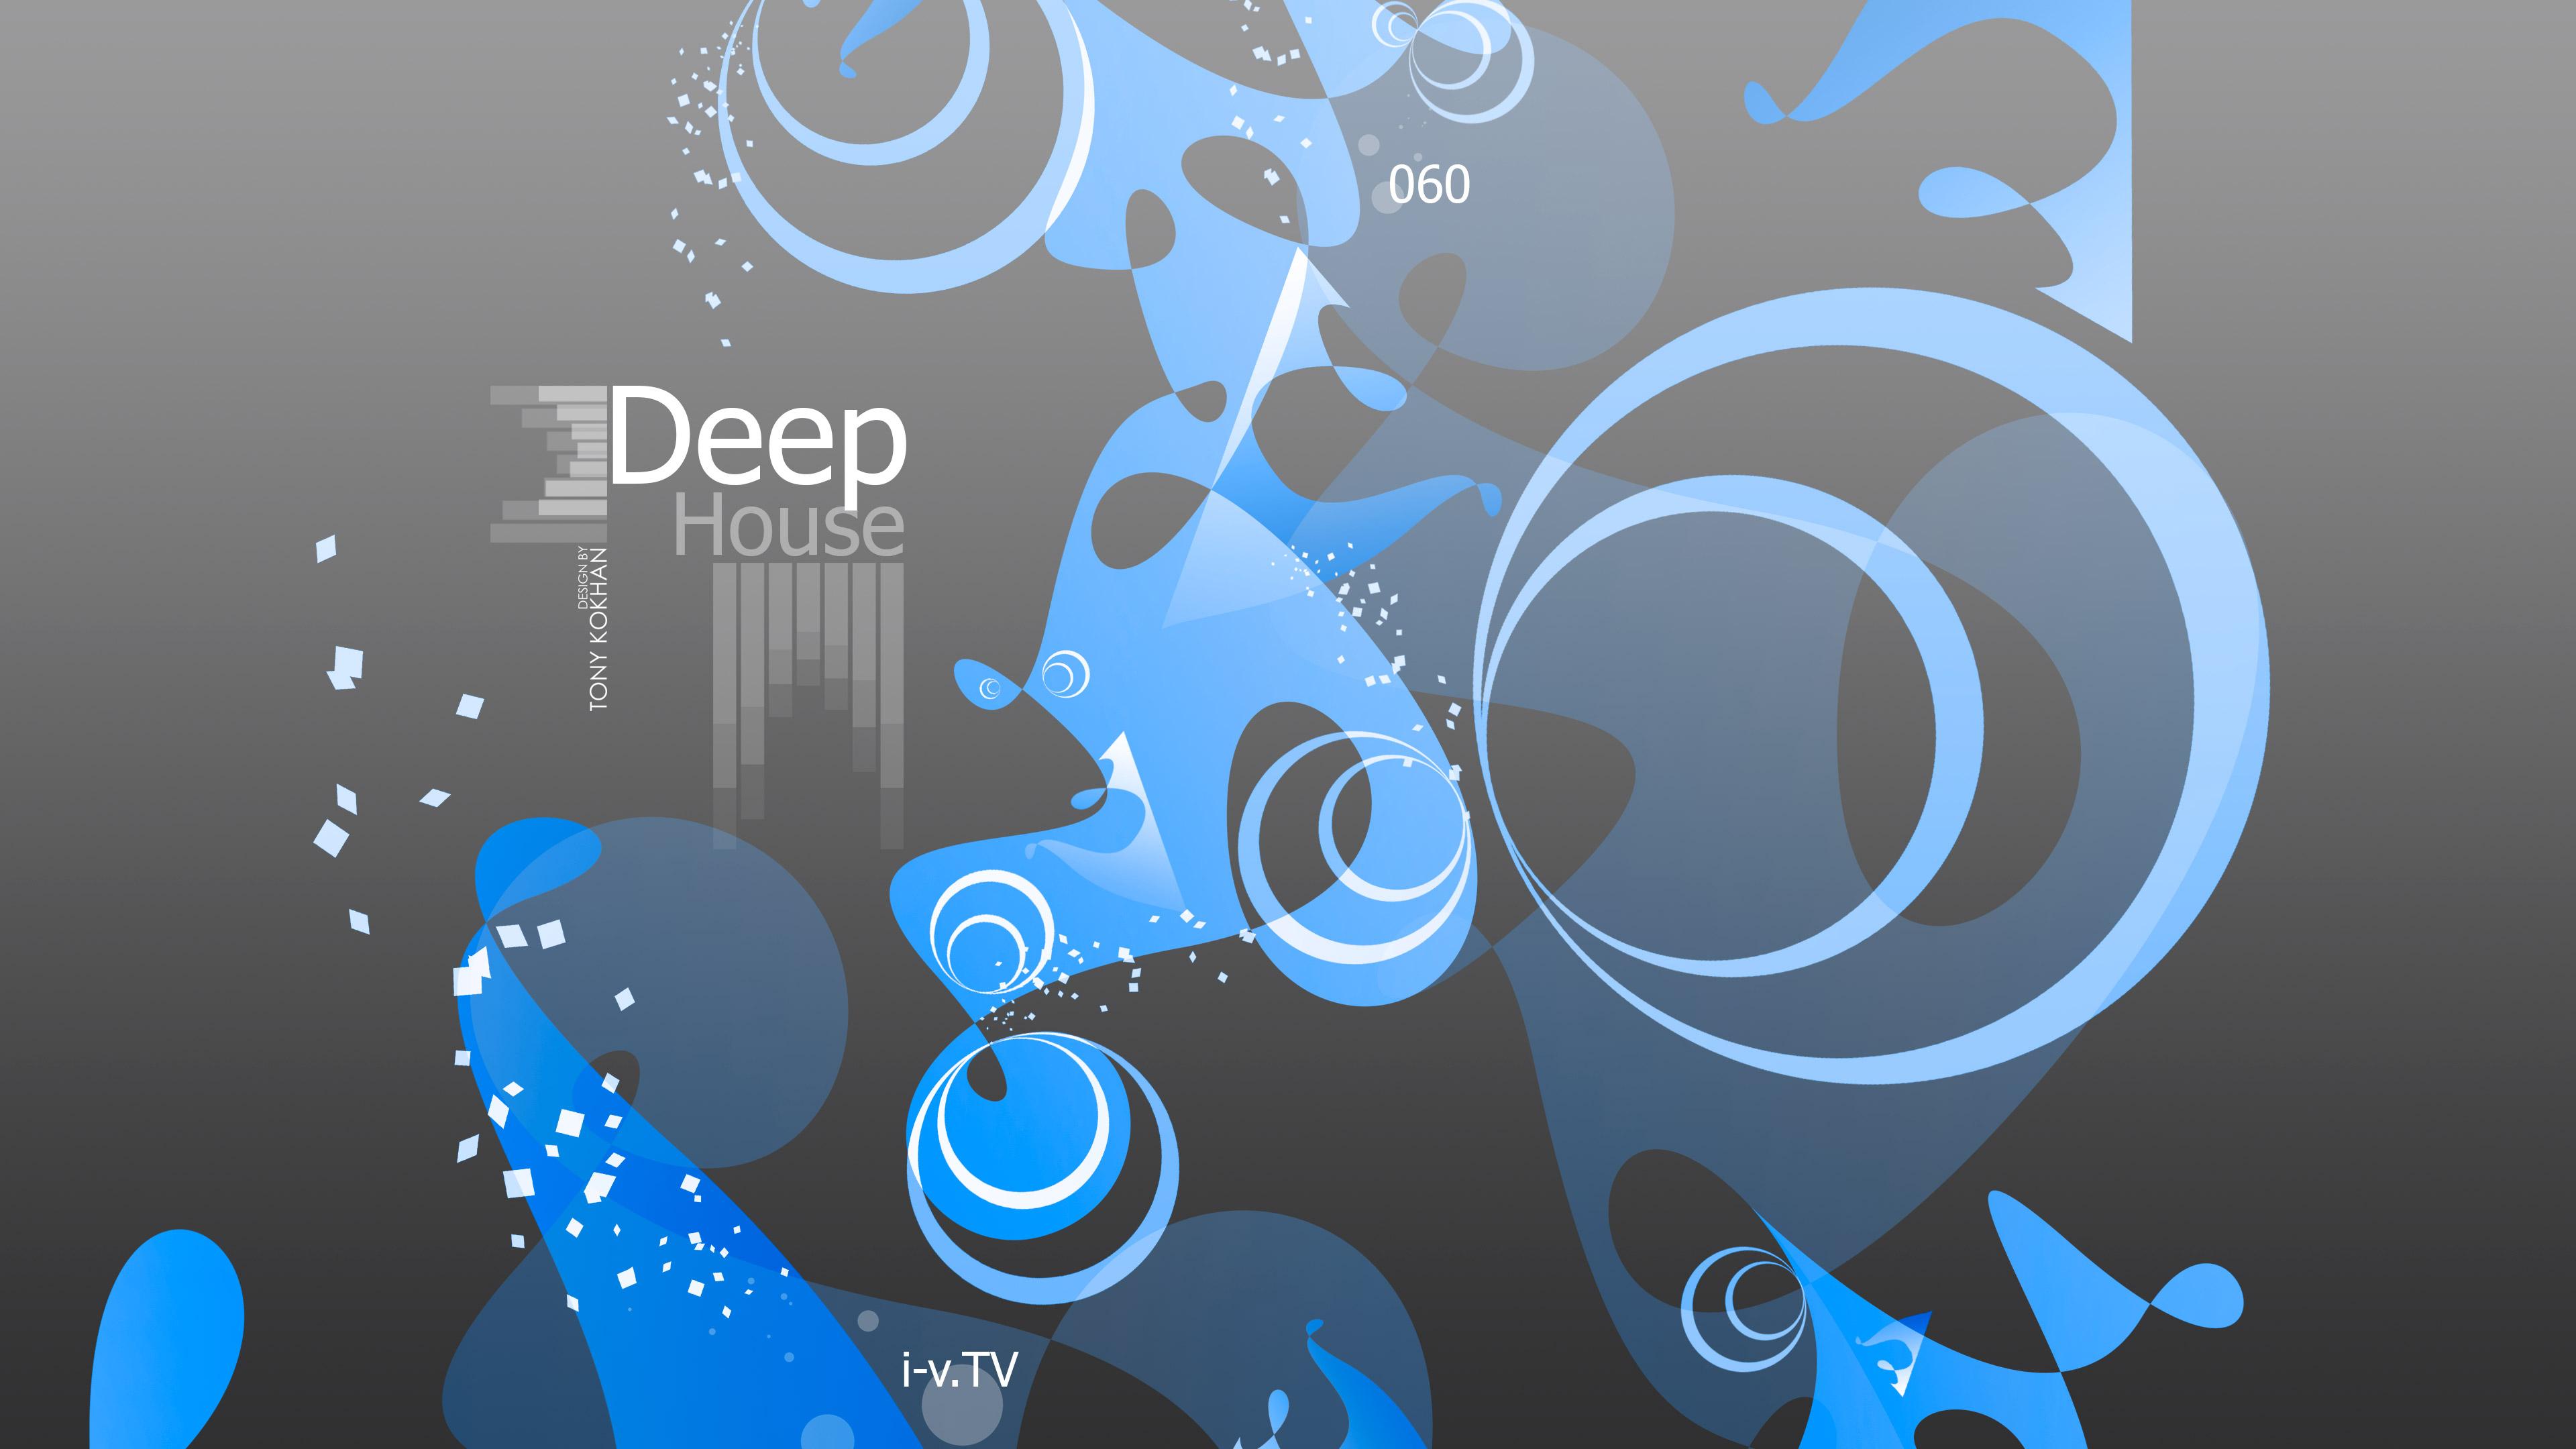 Deep House Music eQ SC Sixty 2016 Tony Kokhan Sound 3840x2160